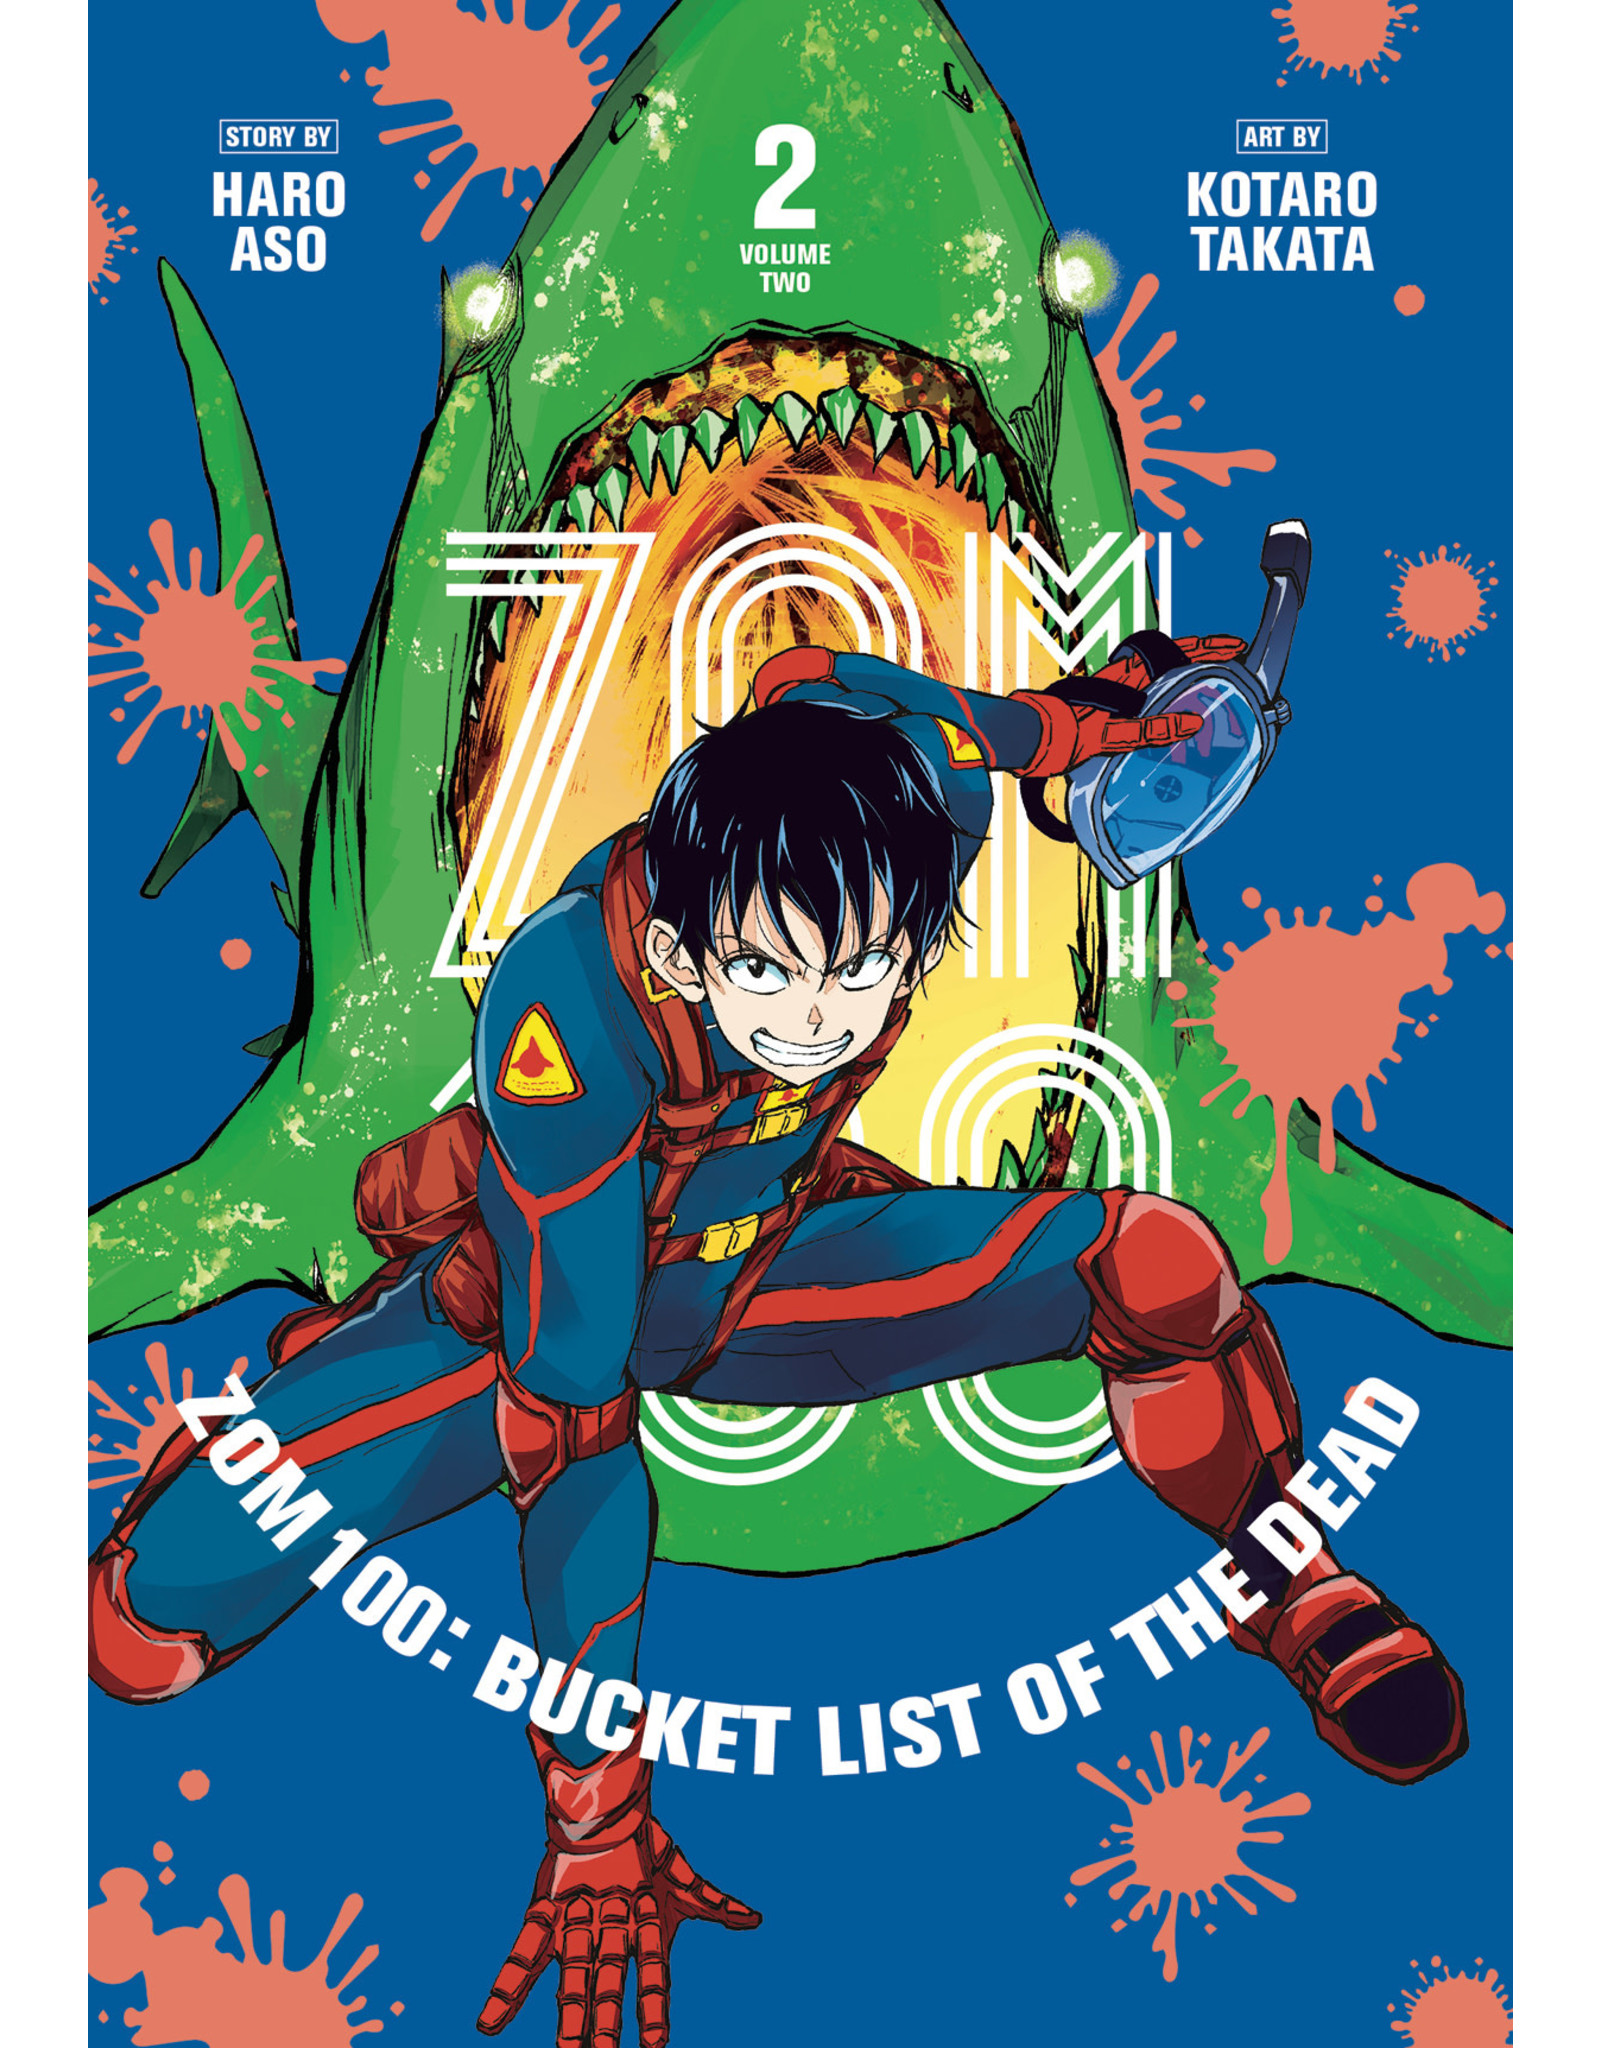 Zom 100: Bucket List Of The Dead 2 (English) - Manga